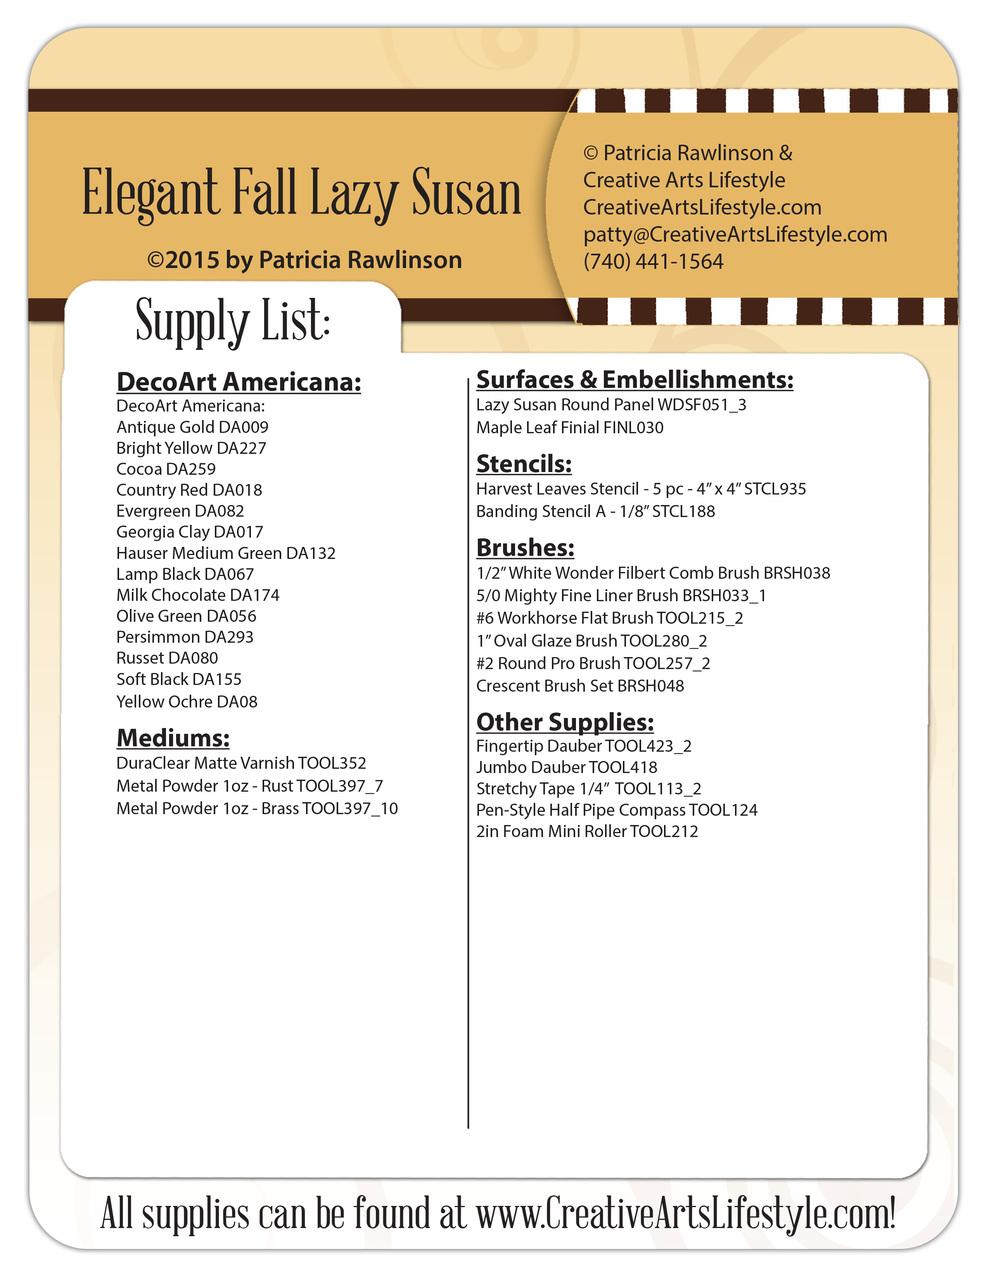 Elegant Fall Lazy Susan - E-Packet - Patricia Rawlinson